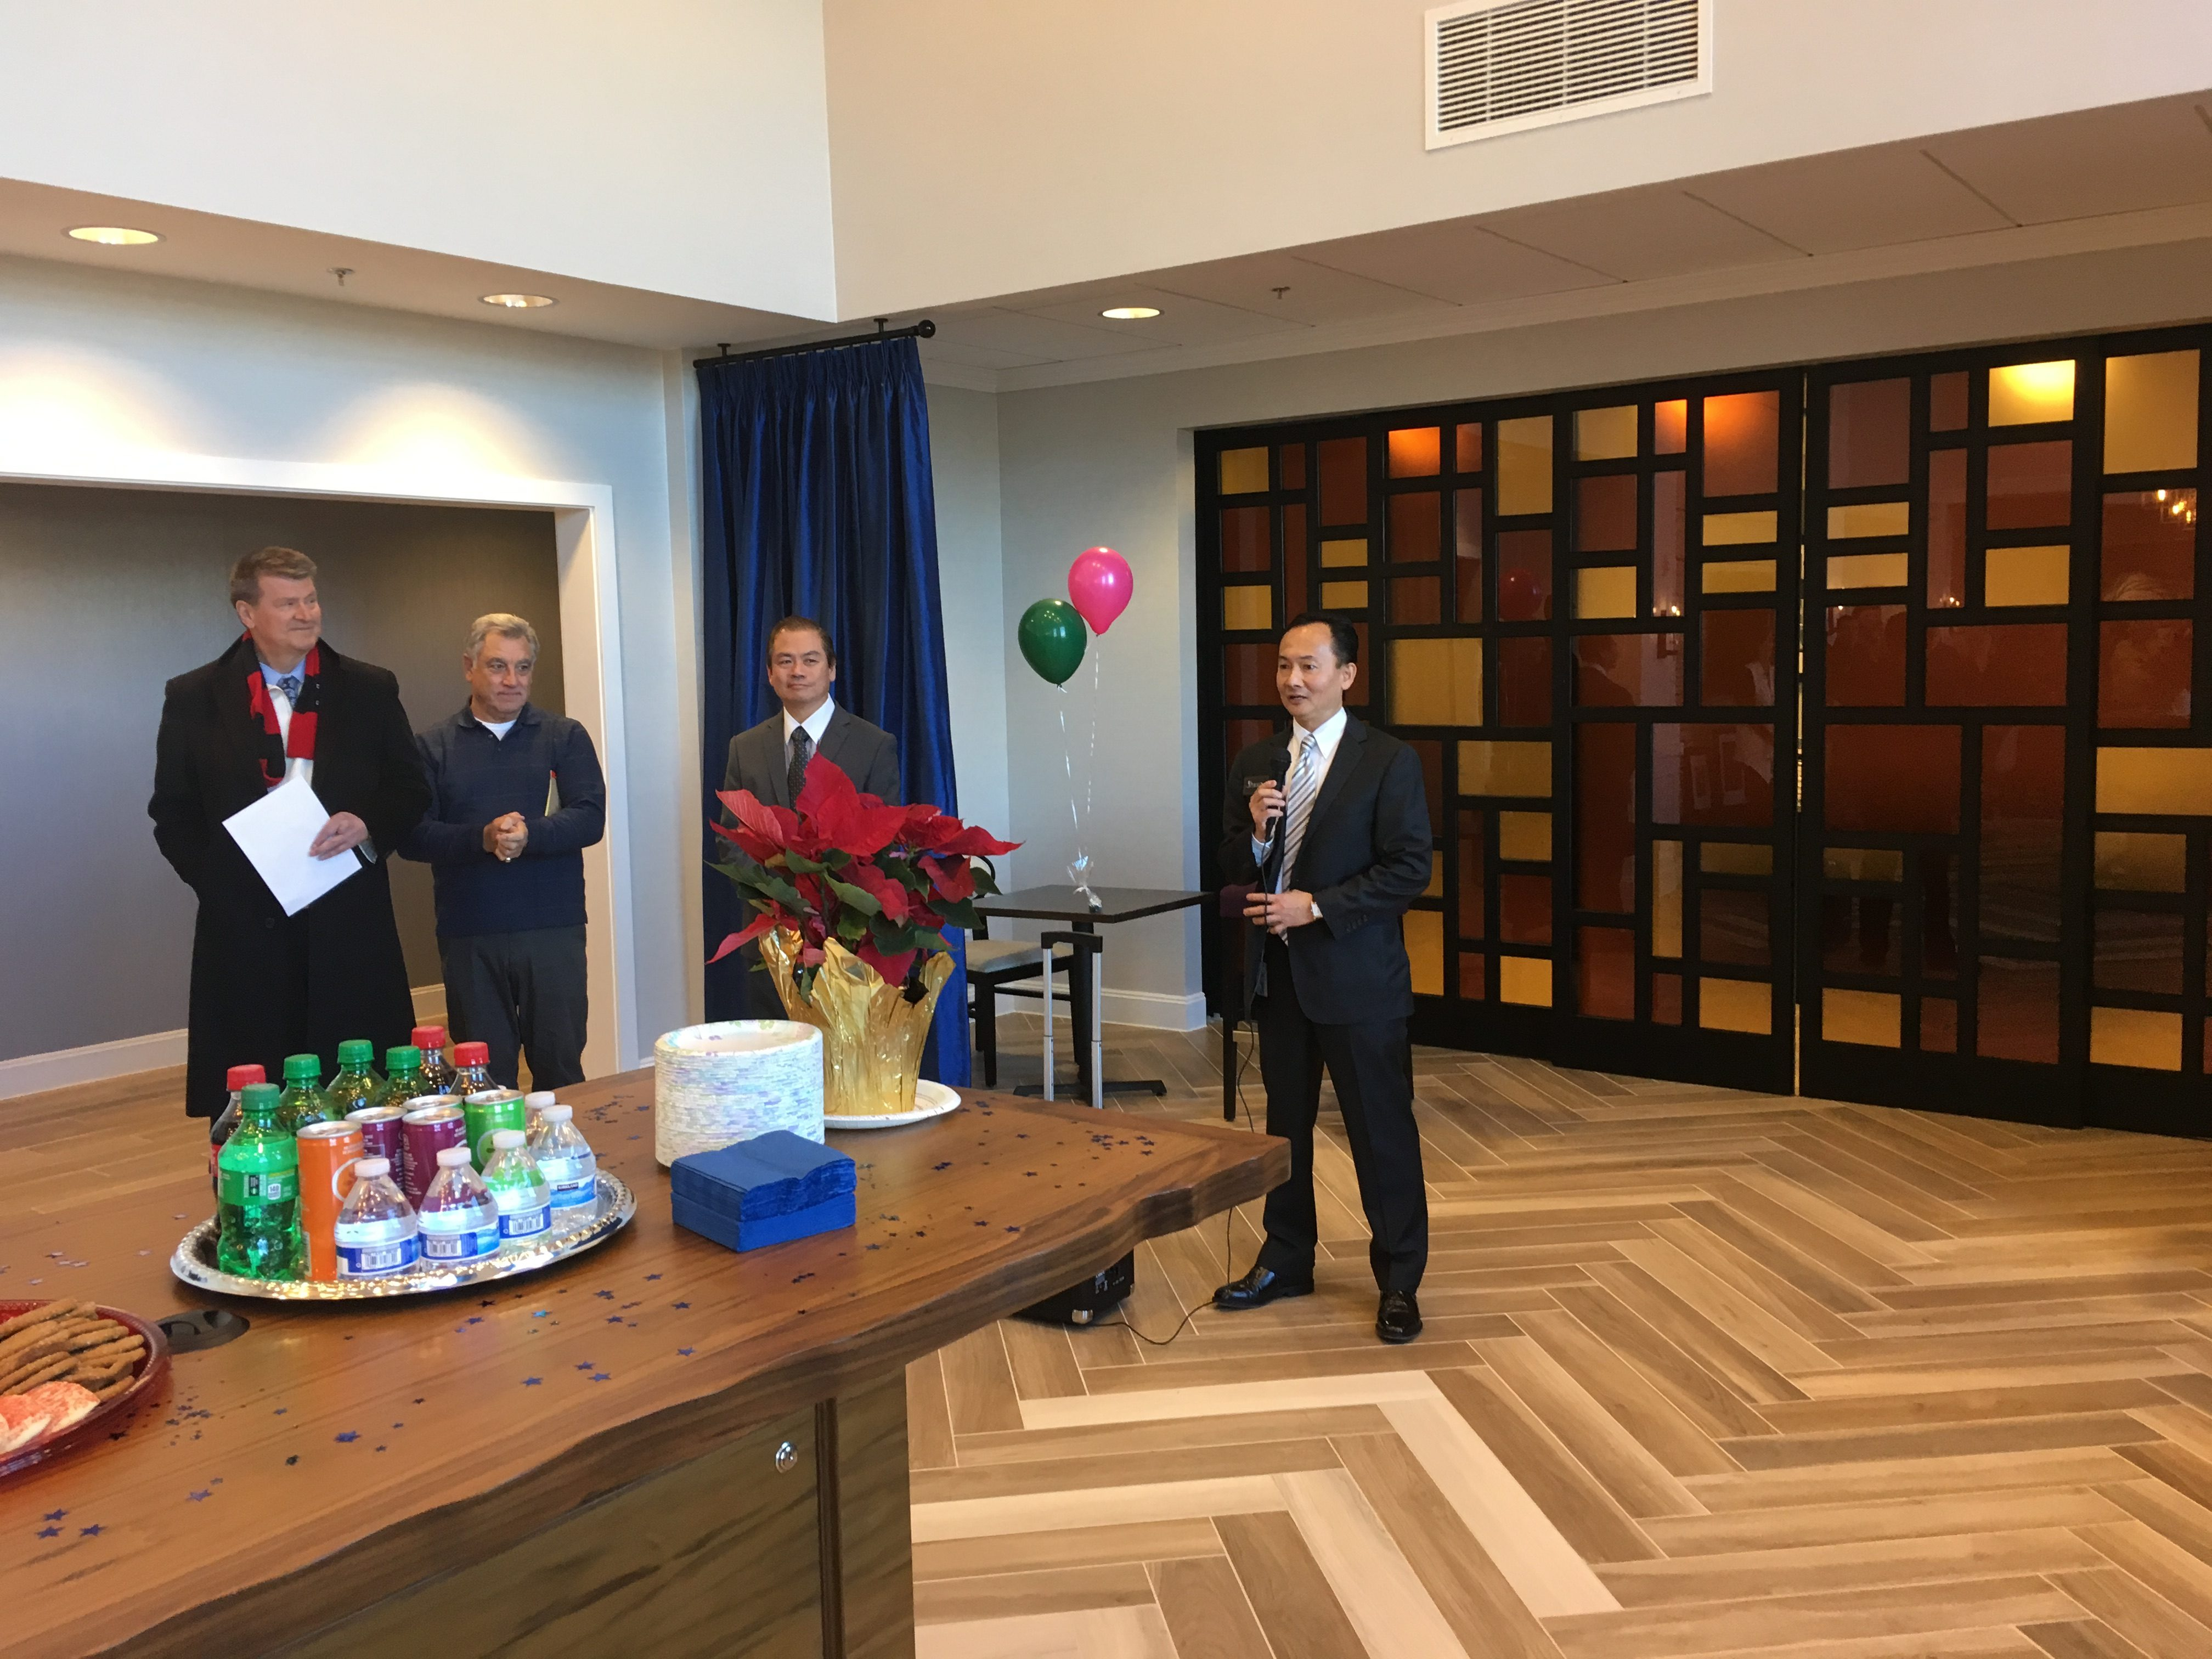 Hampton Inn & Suites by Hilton Newport Cincinnati owner Shaun Pan welcomes guests at Thursday's ribbon cutting (photos by Mark Hansel).